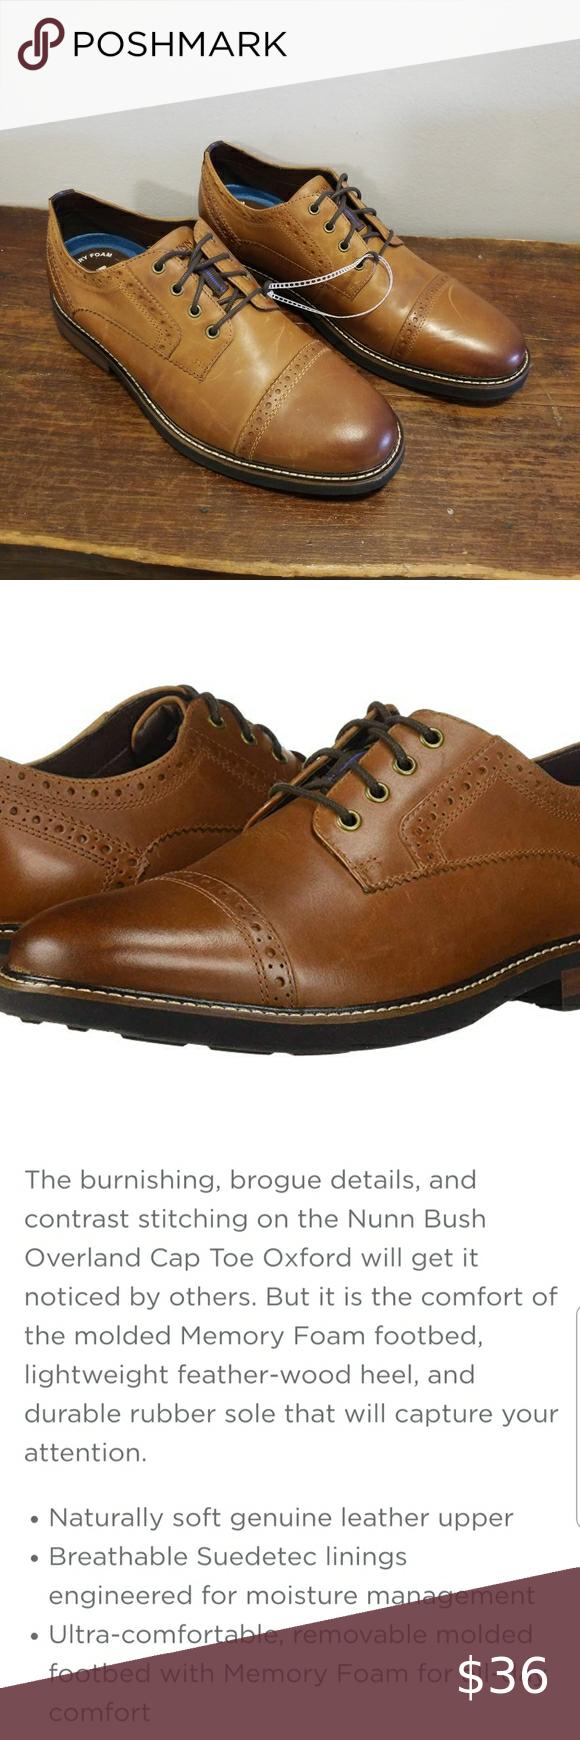 23+ Nunn bush mens shoes ideas information